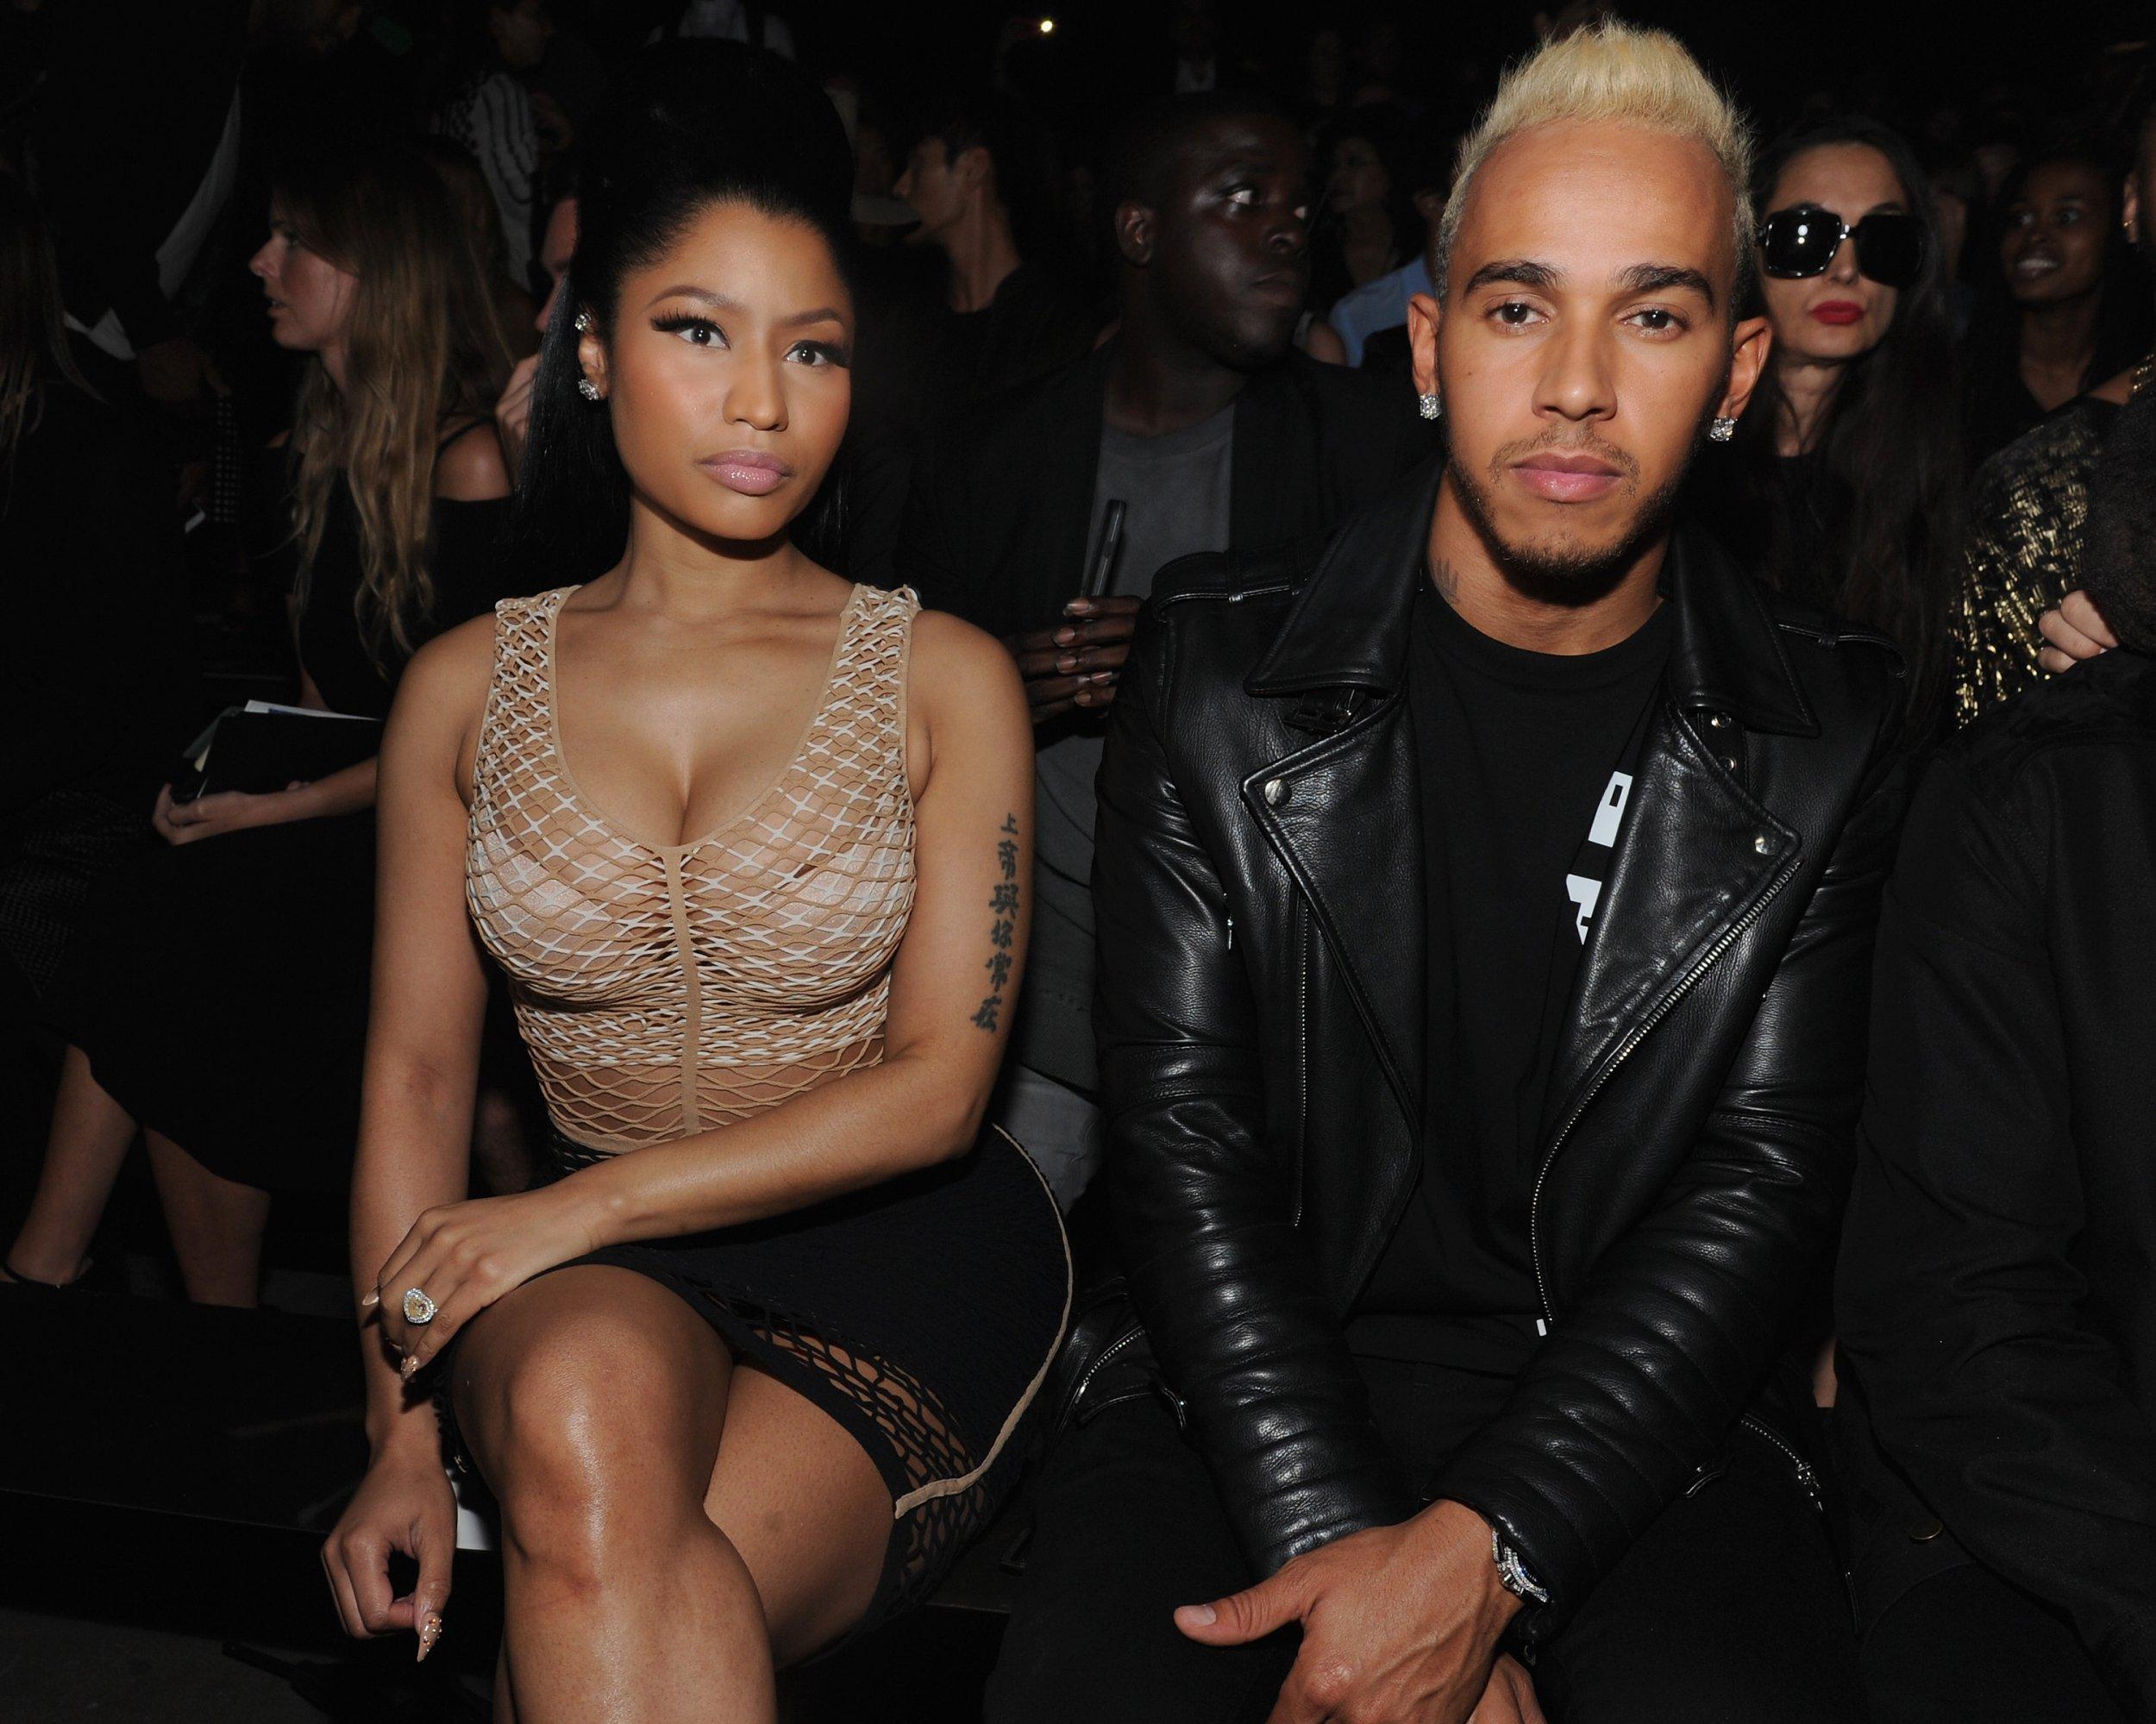 New footage of Nicki Minaj and Lewis Hamilton in Dubai ignites fresh dating rumours